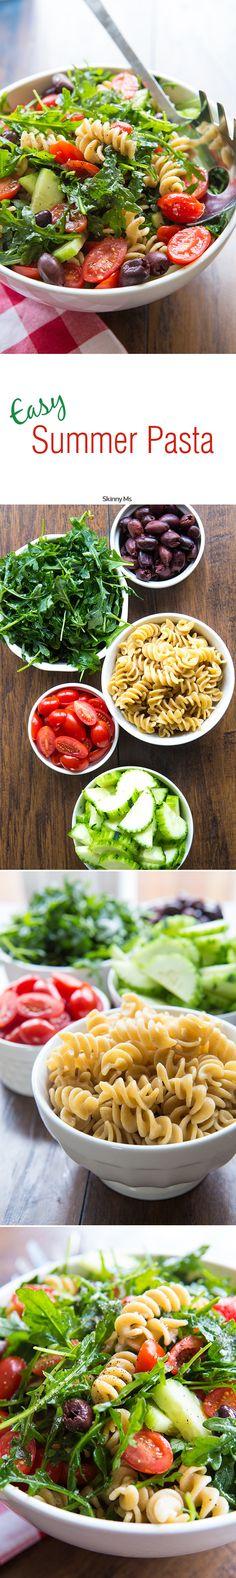 Easy Pasta Salad with Cucumbers & Tomatoes - delish! #easypastasalad #pastasalad #summerrecipes